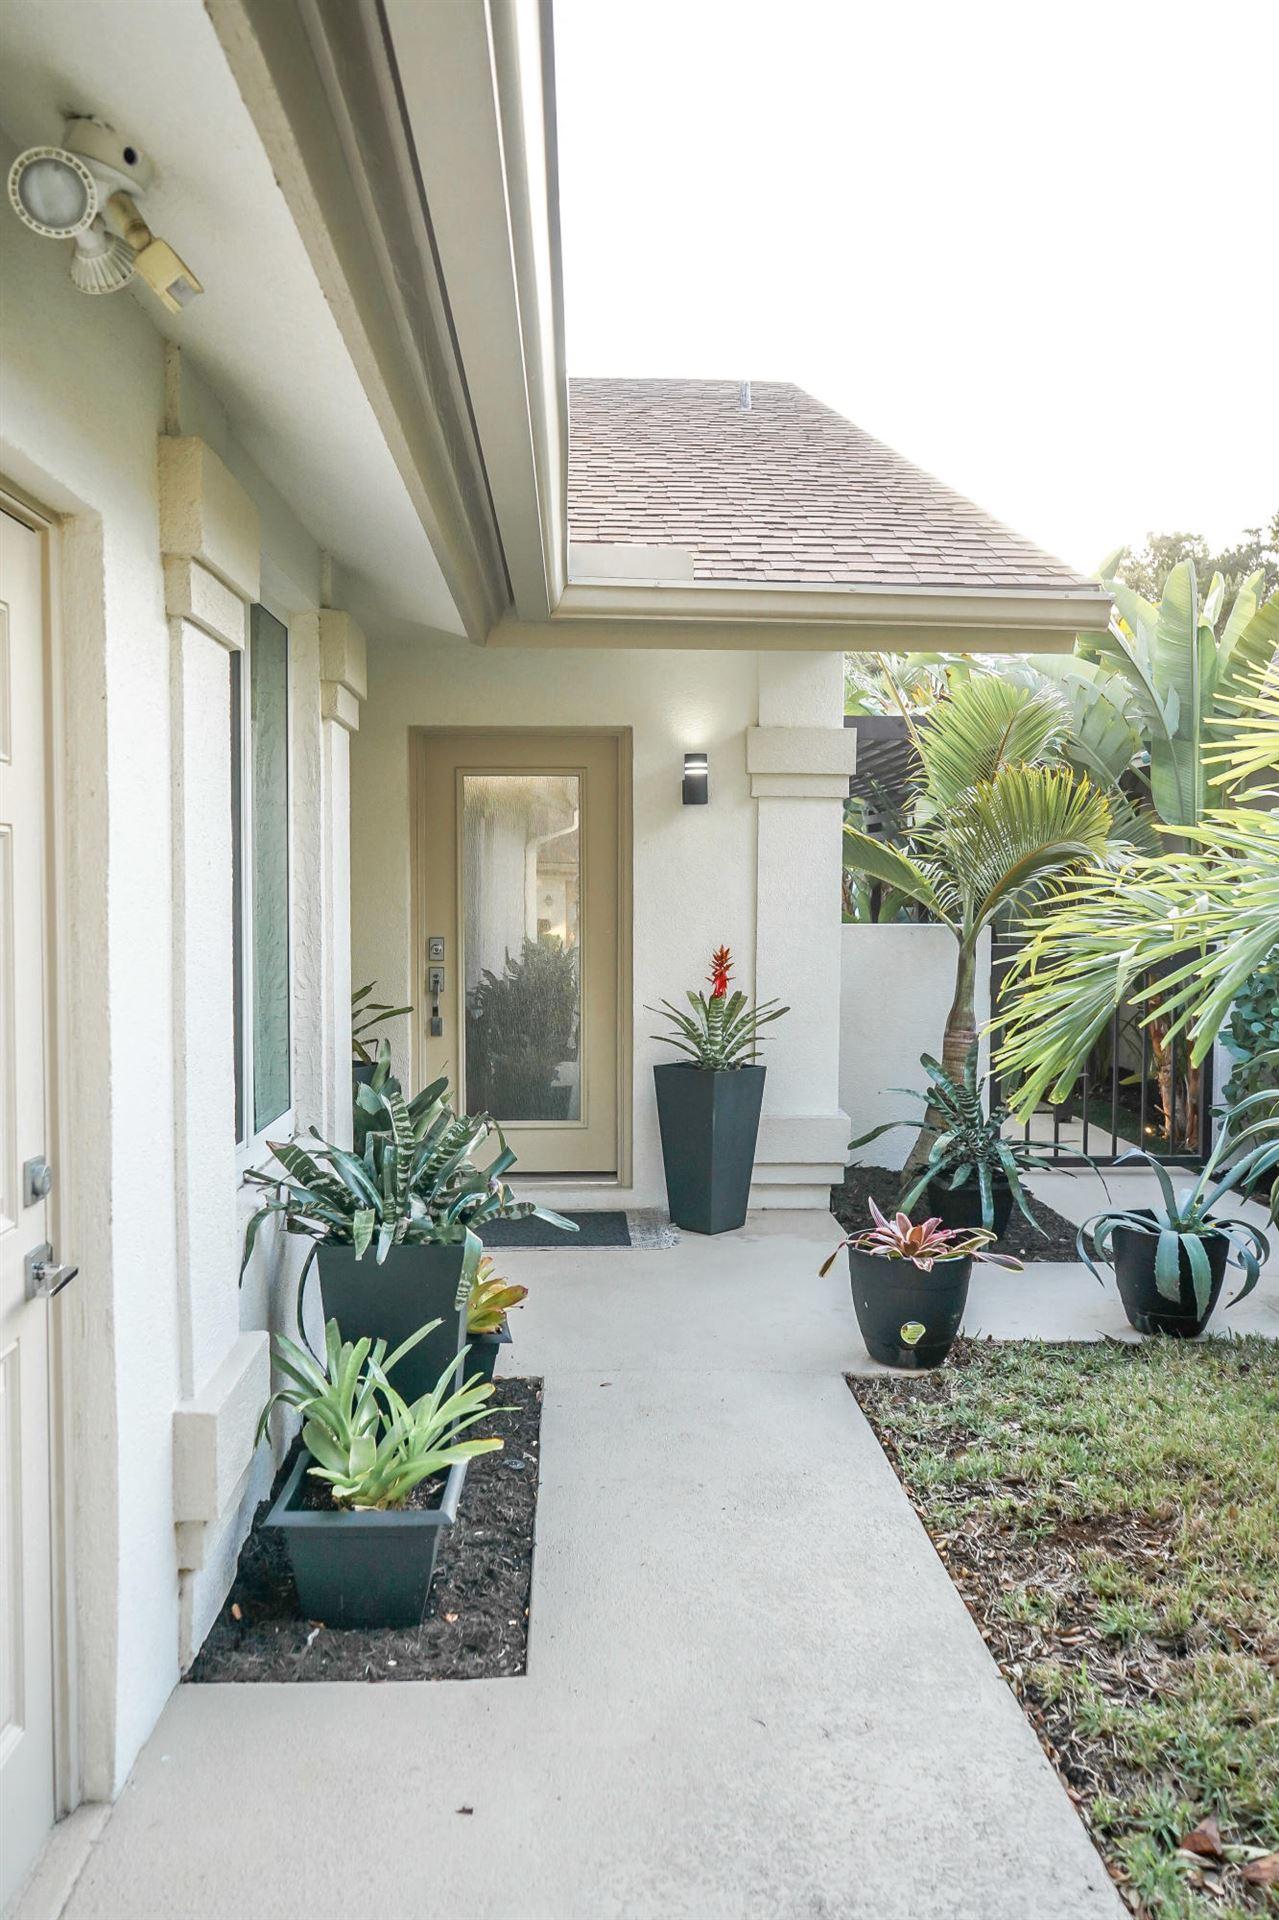 Photo of 126 Seashore Drive, Jupiter, FL 33477 (MLS # RX-10668530)